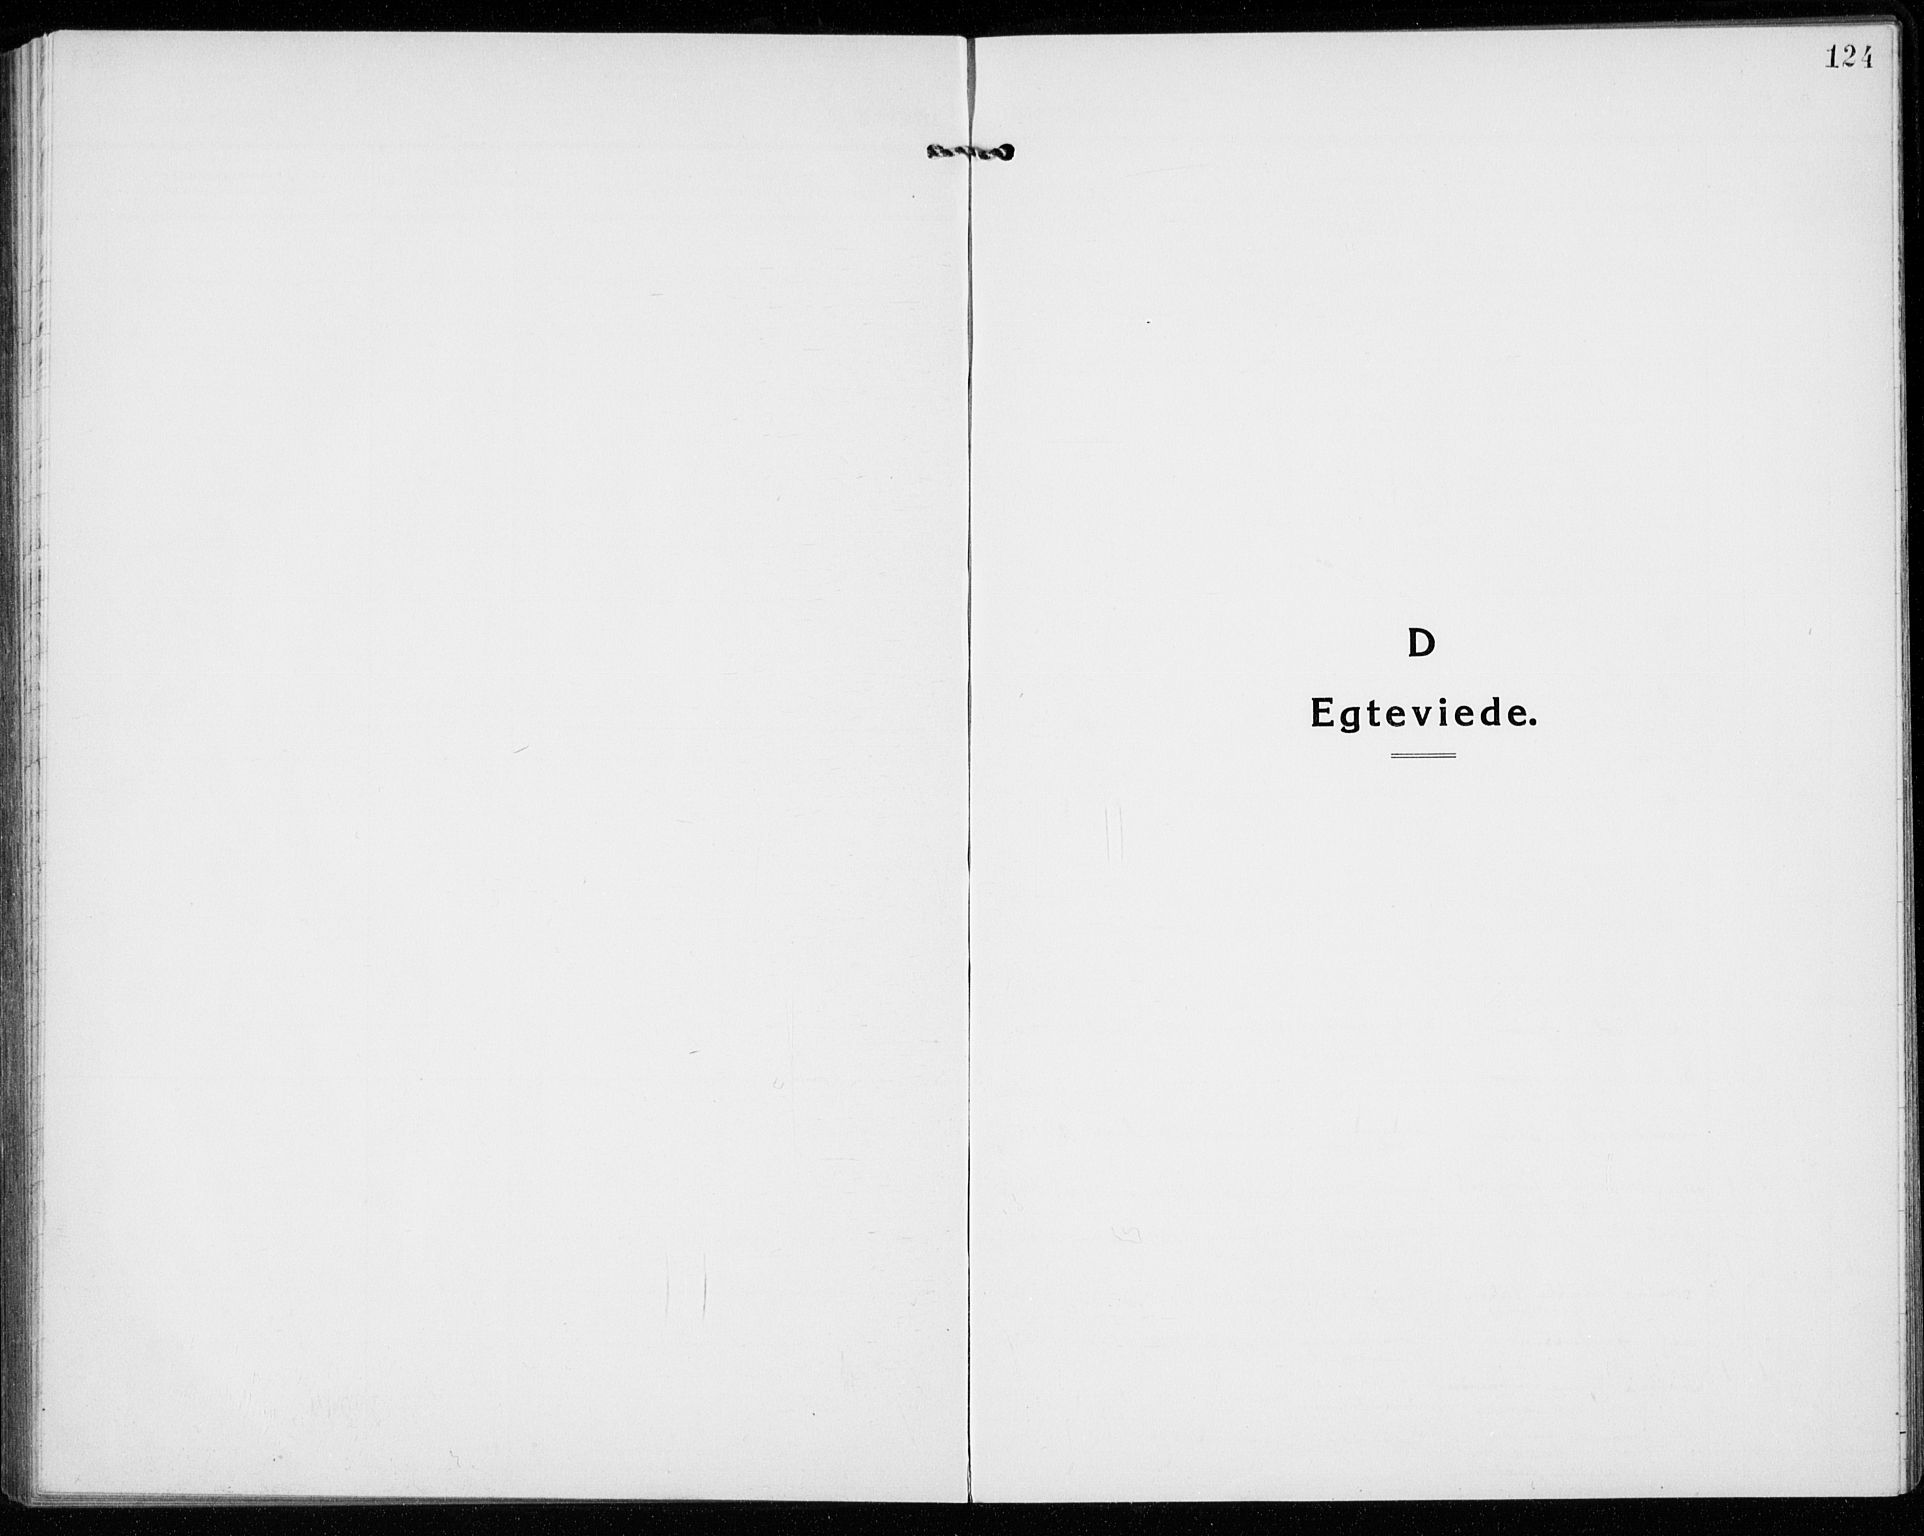 SAKO, Sandefjord kirkebøker, G/Ga/L0004: Klokkerbok nr. 4, 1920-1931, s. 124